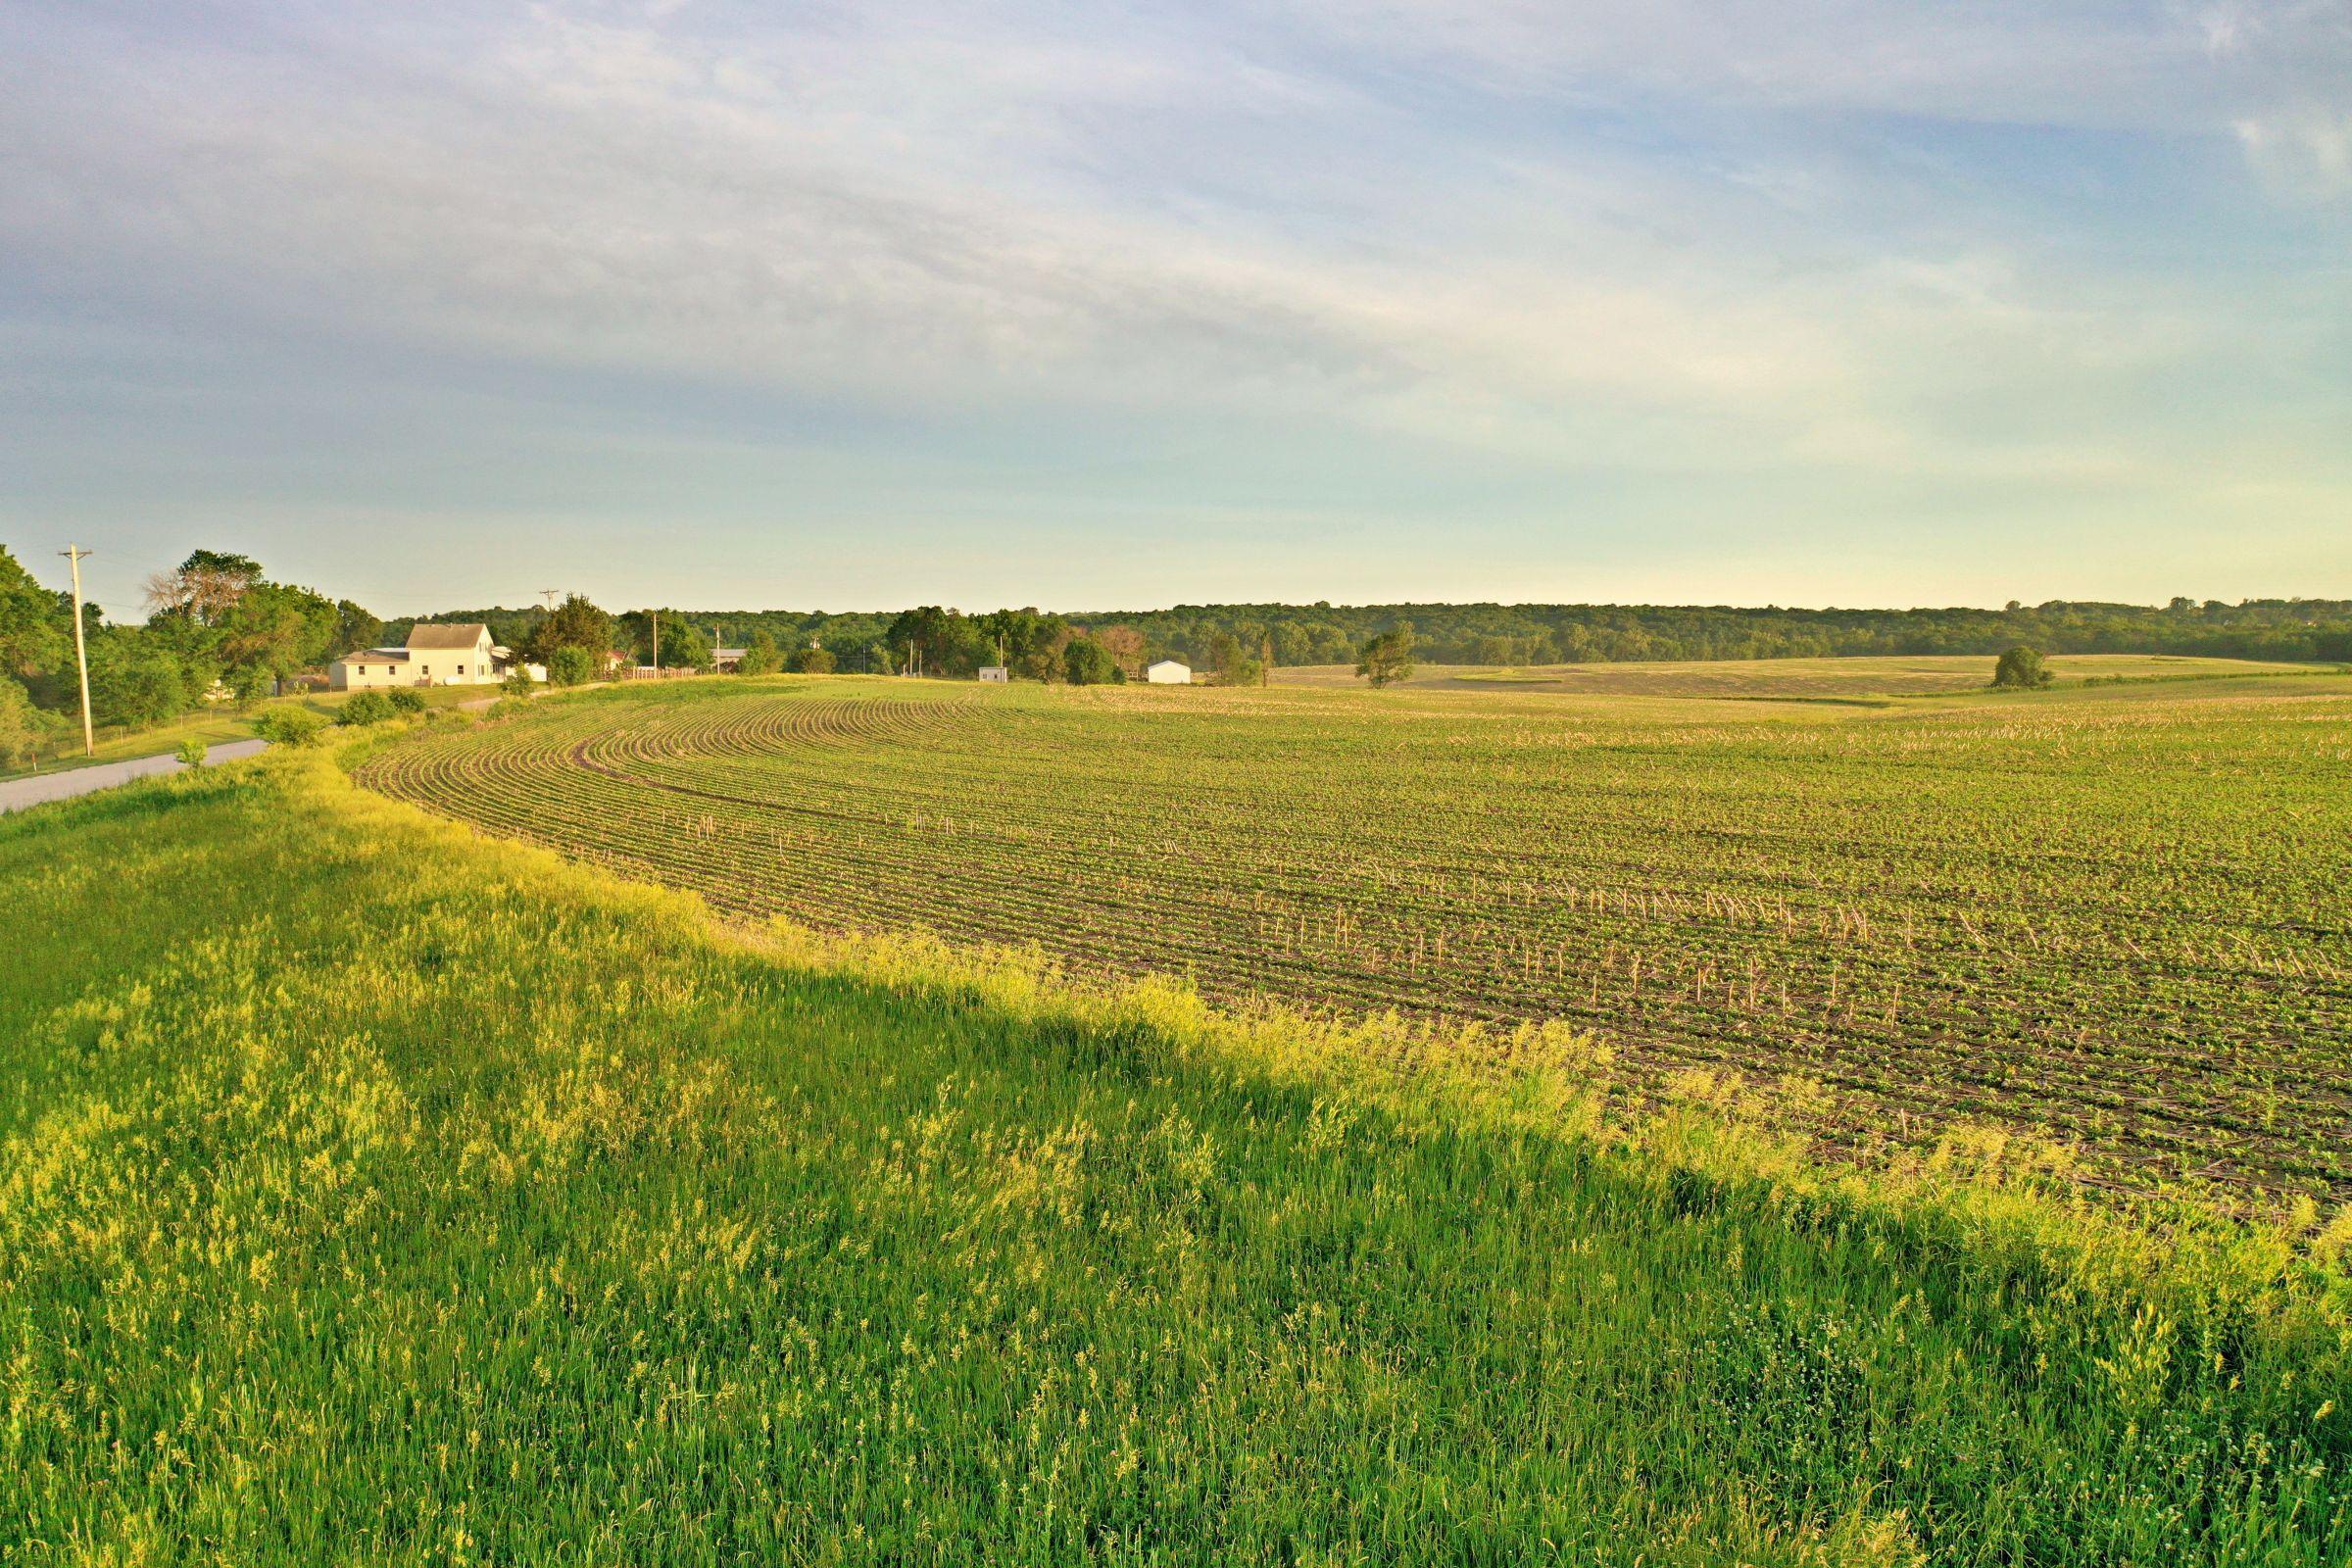 development-land-warren-county-iowa-20-acres-listing-number-15423-2-2021-03-25-202926.JPG